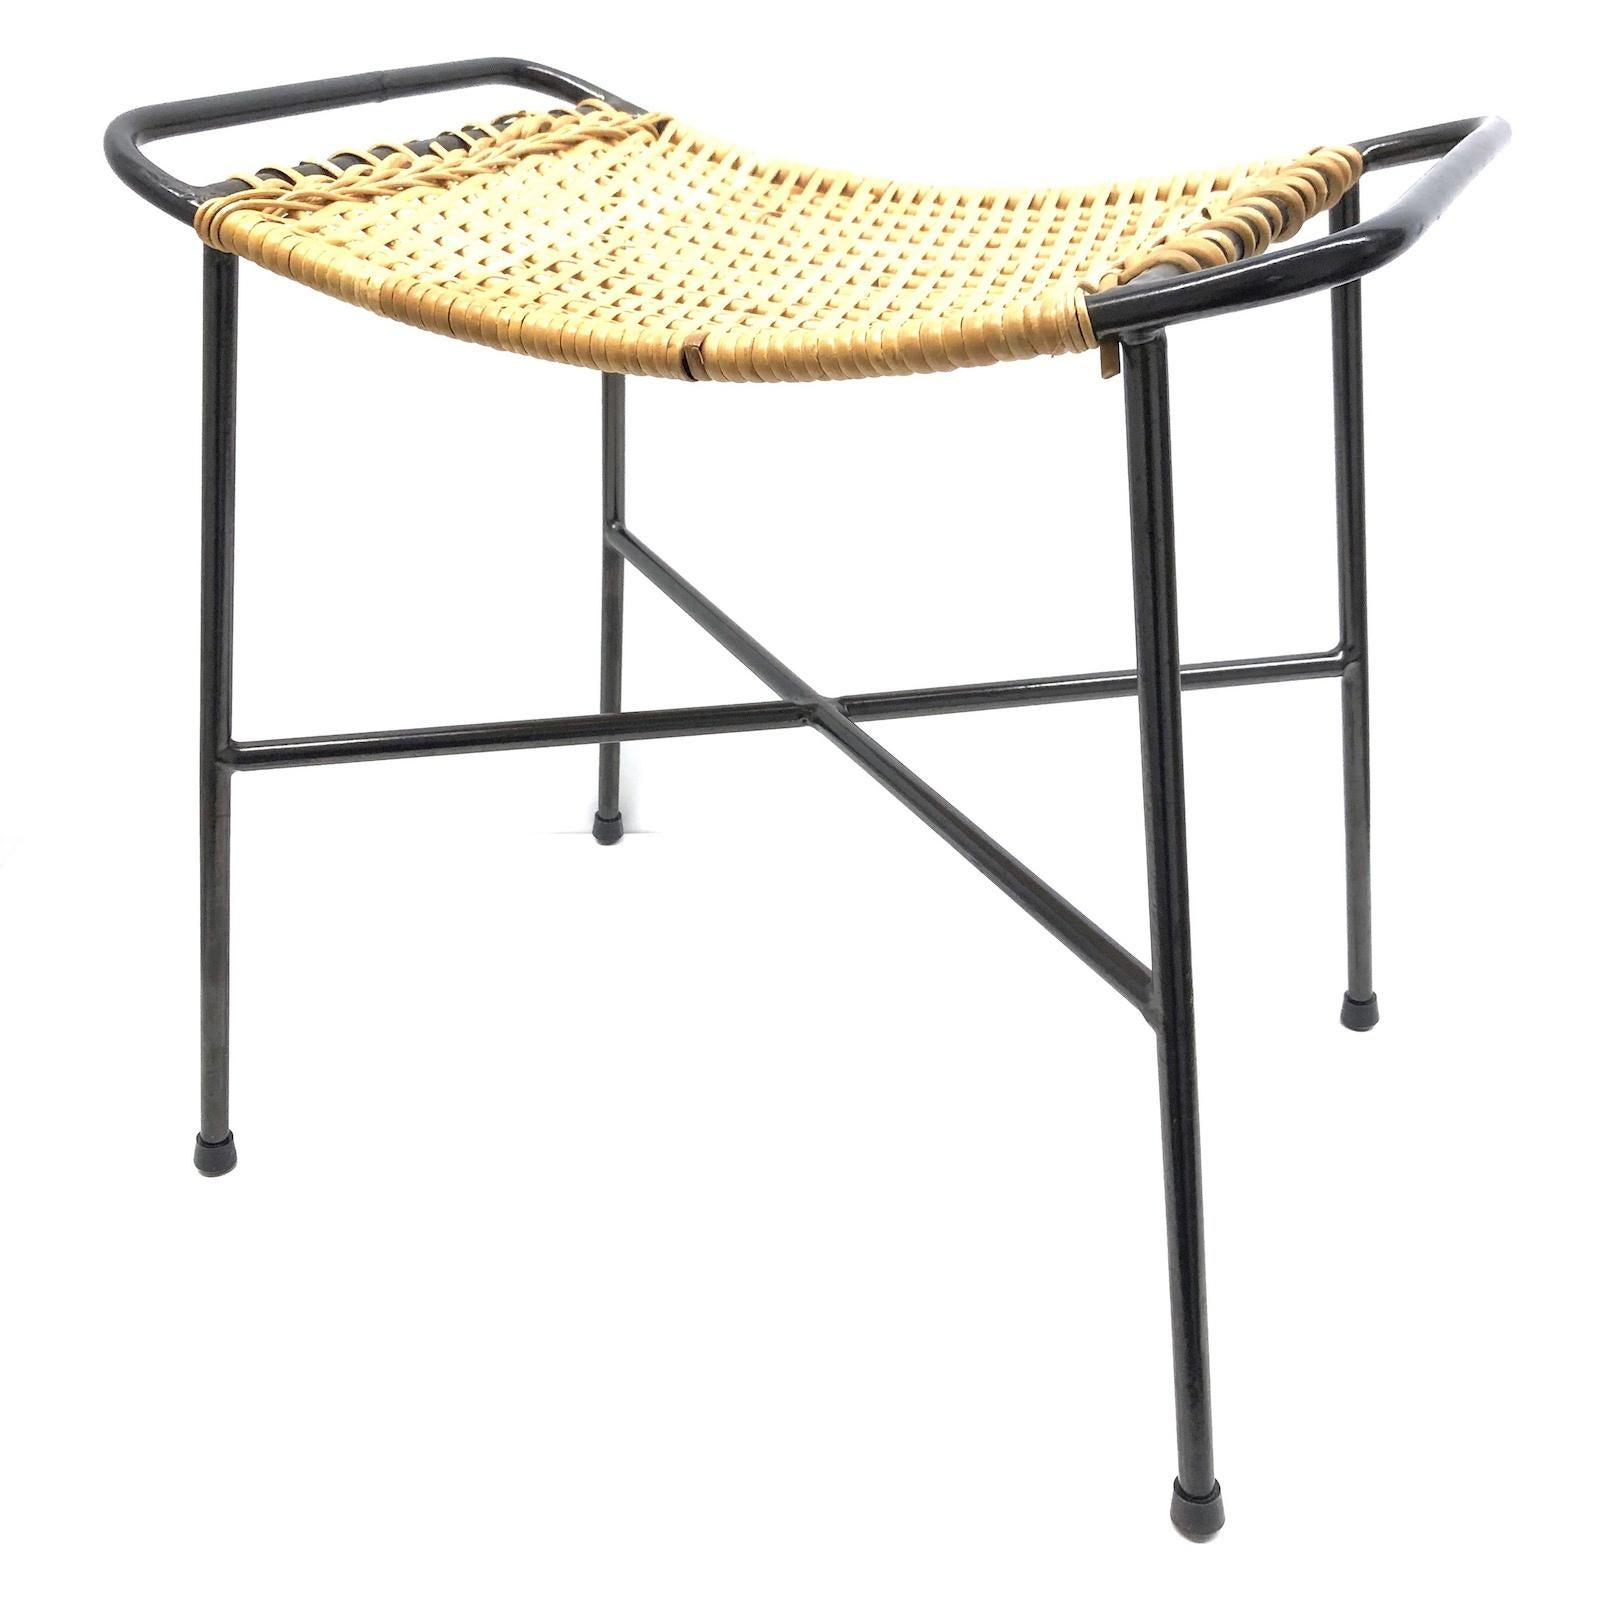 Surprising Wire Wicker Work Mid Century Modern Footrest Ottoman Stool String Style 1950S Evergreenethics Interior Chair Design Evergreenethicsorg